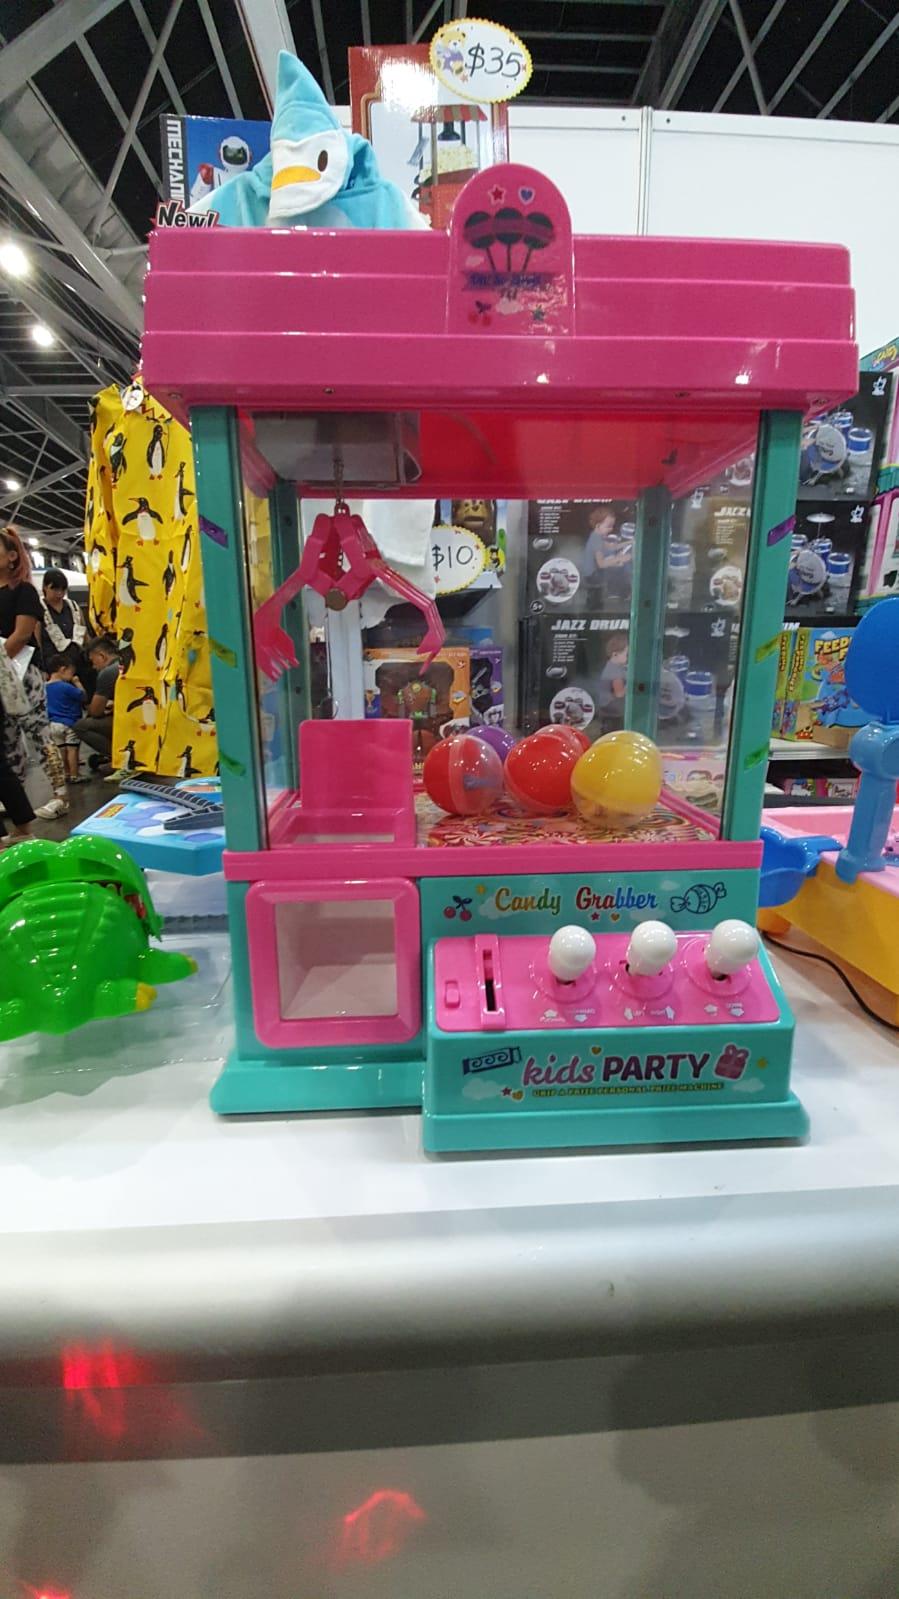 Pink Candy Catcher